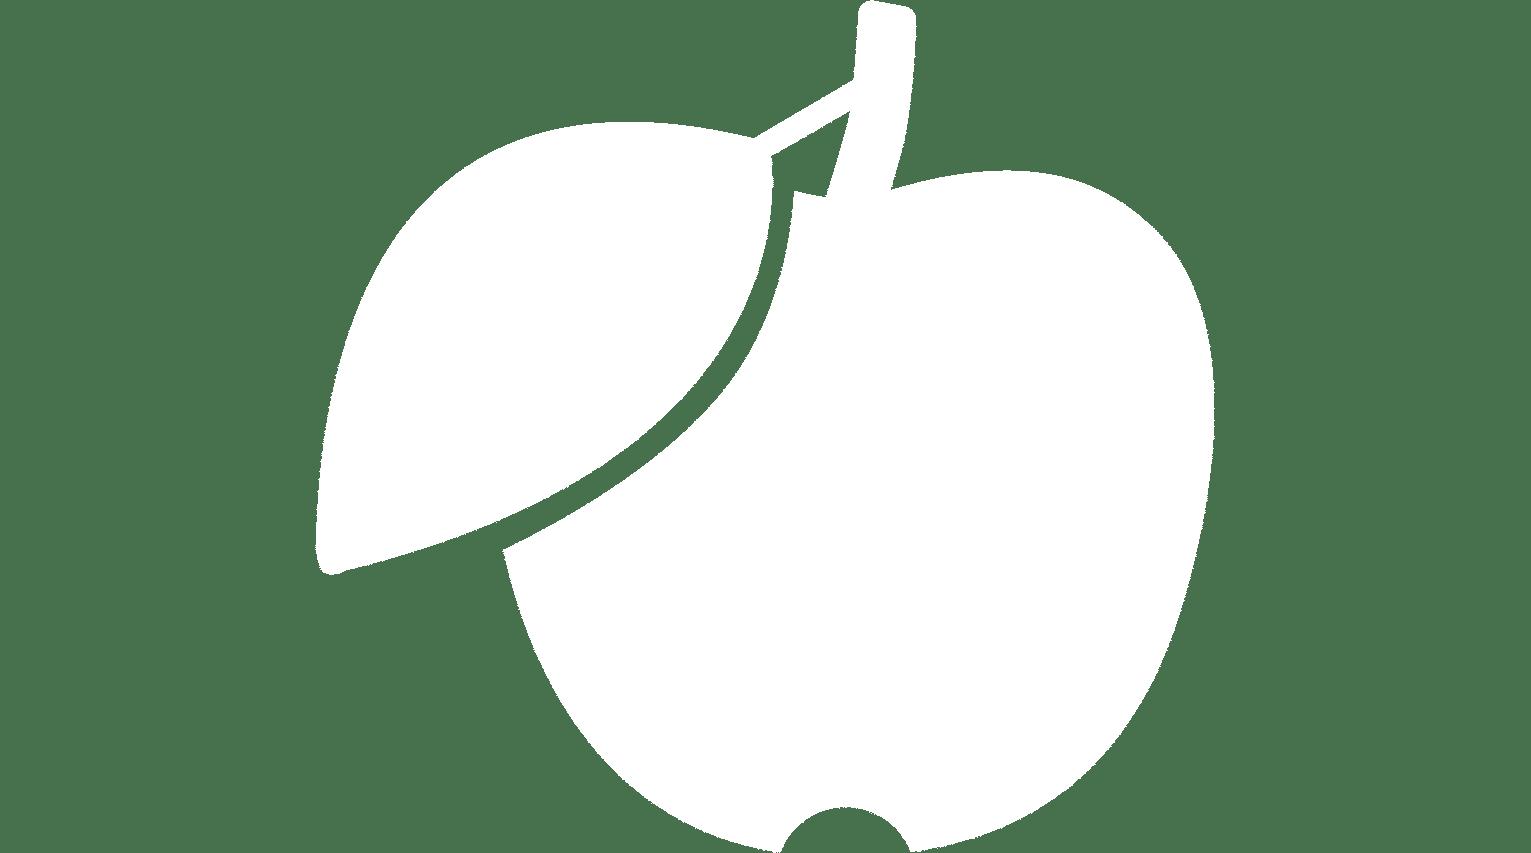 ikon-dagligvare-hvit